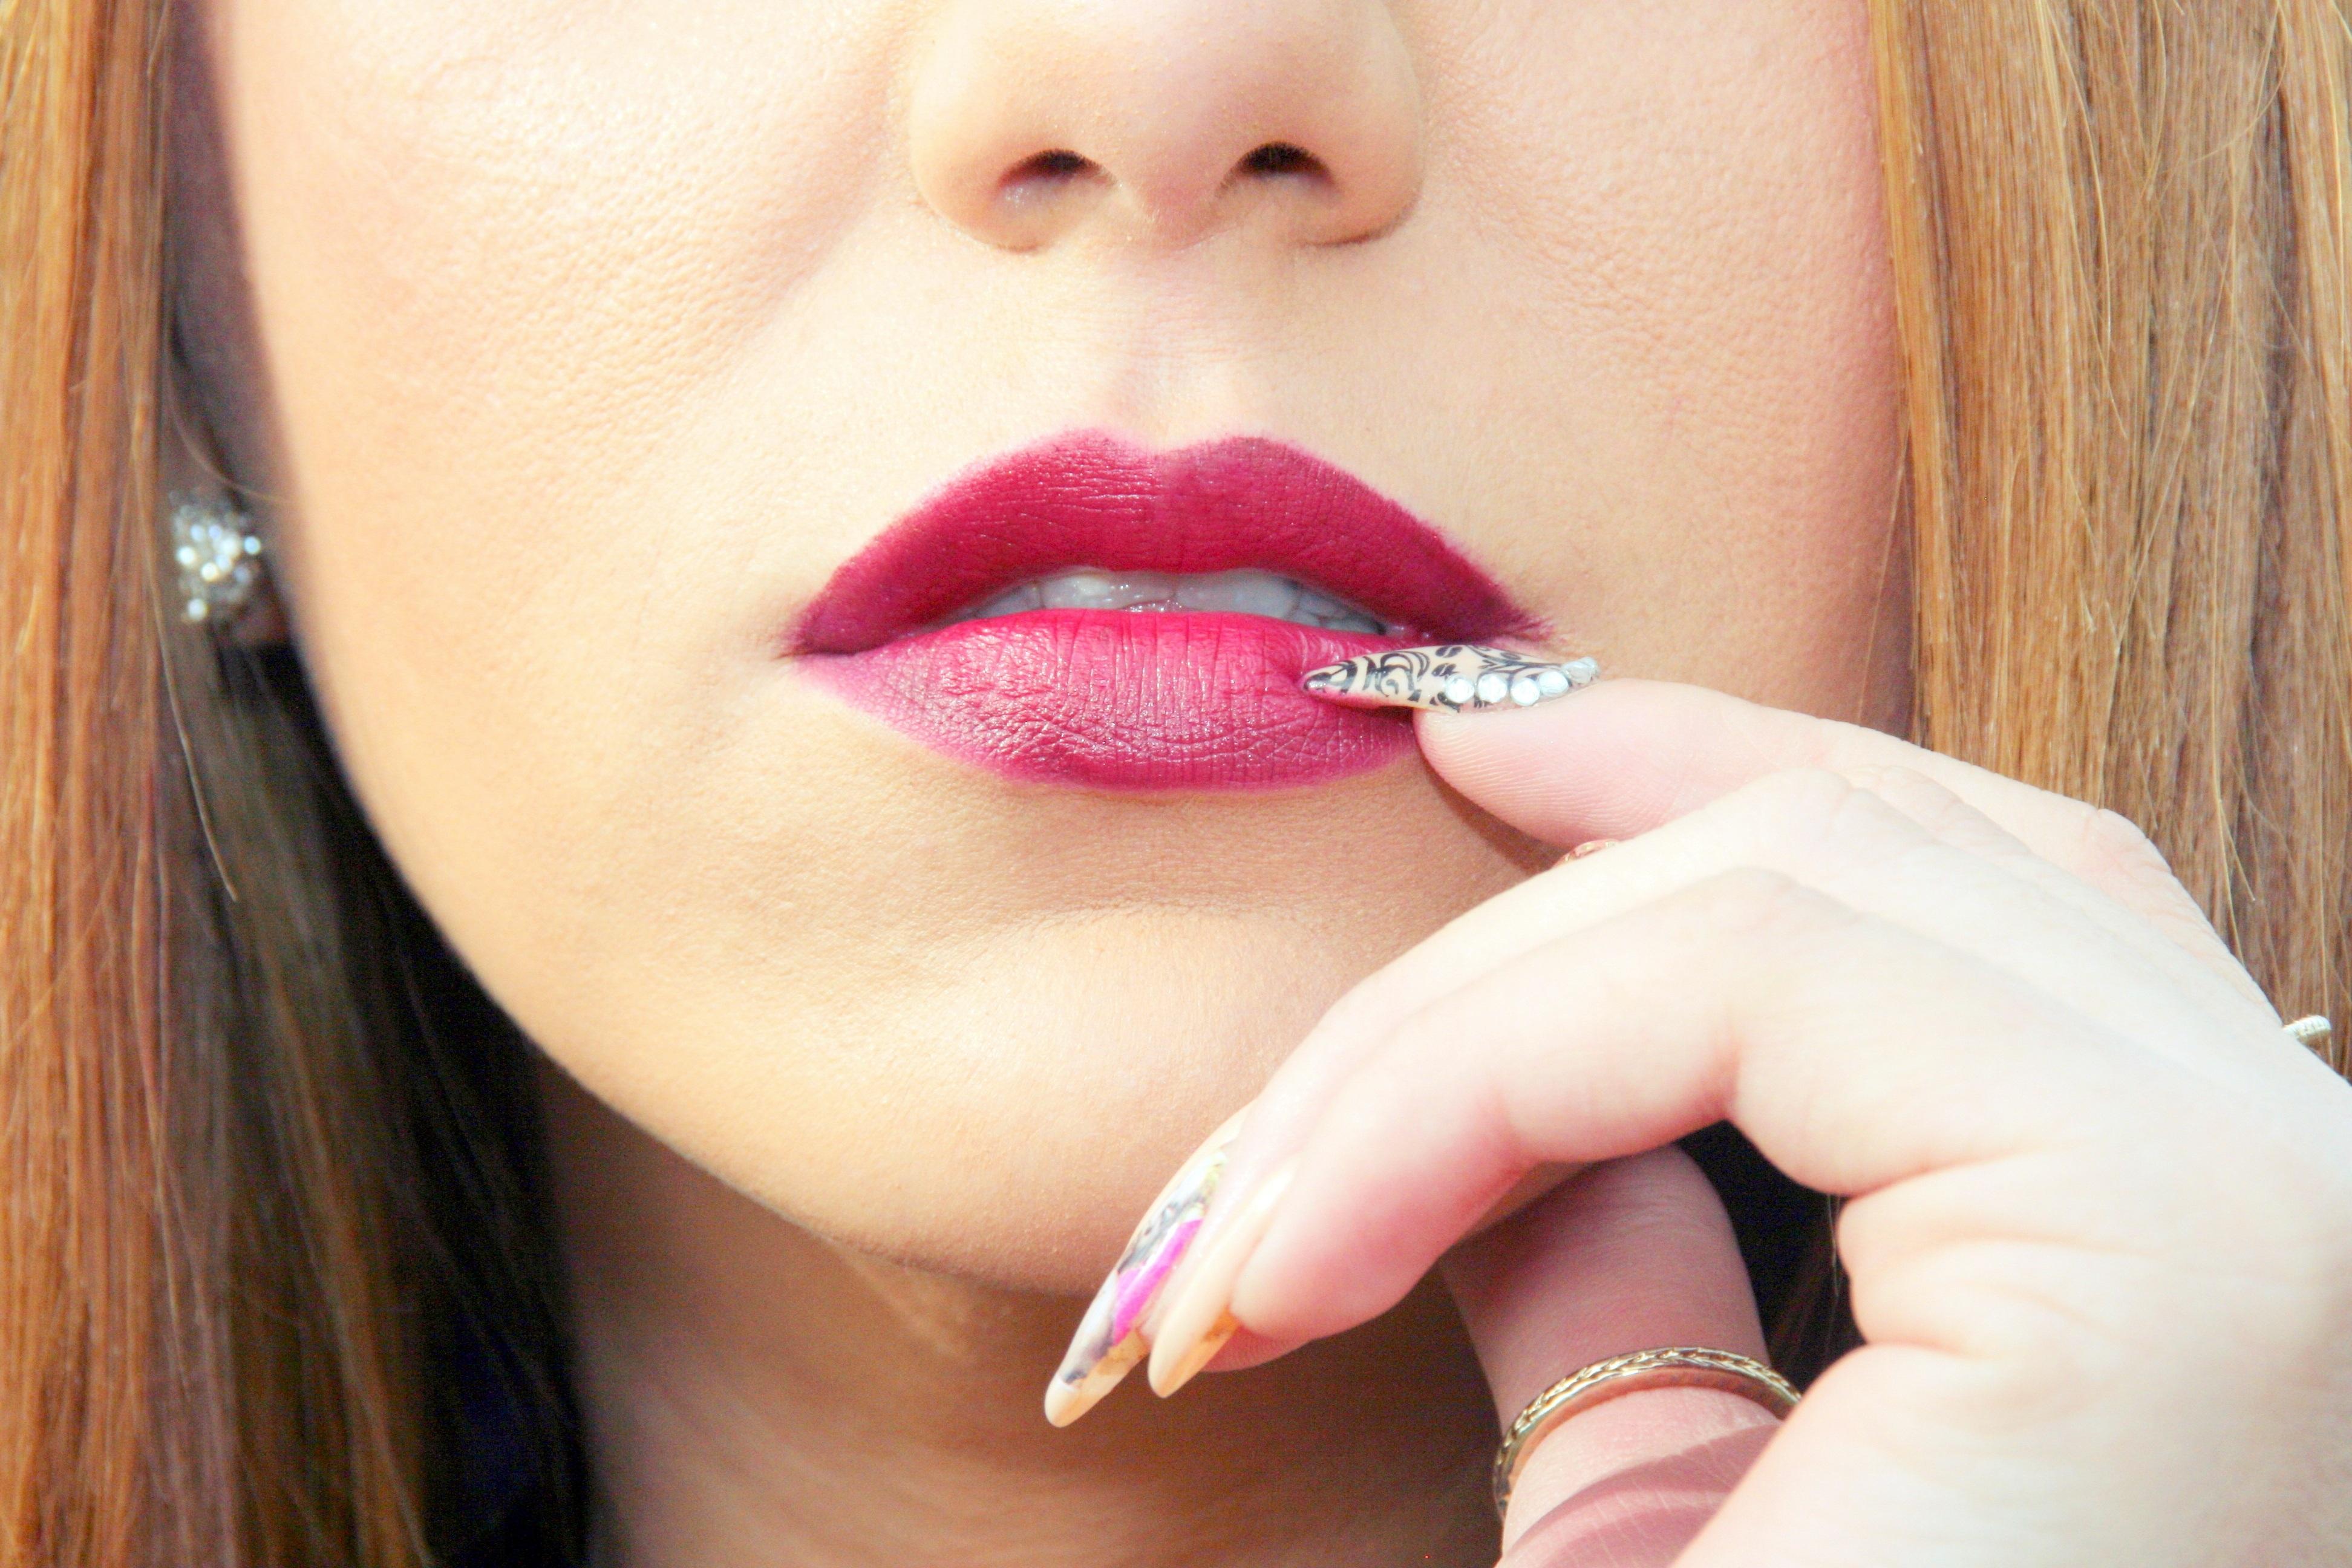 Beauty, Face, Fairy, Lip, Makeup, HQ Photo